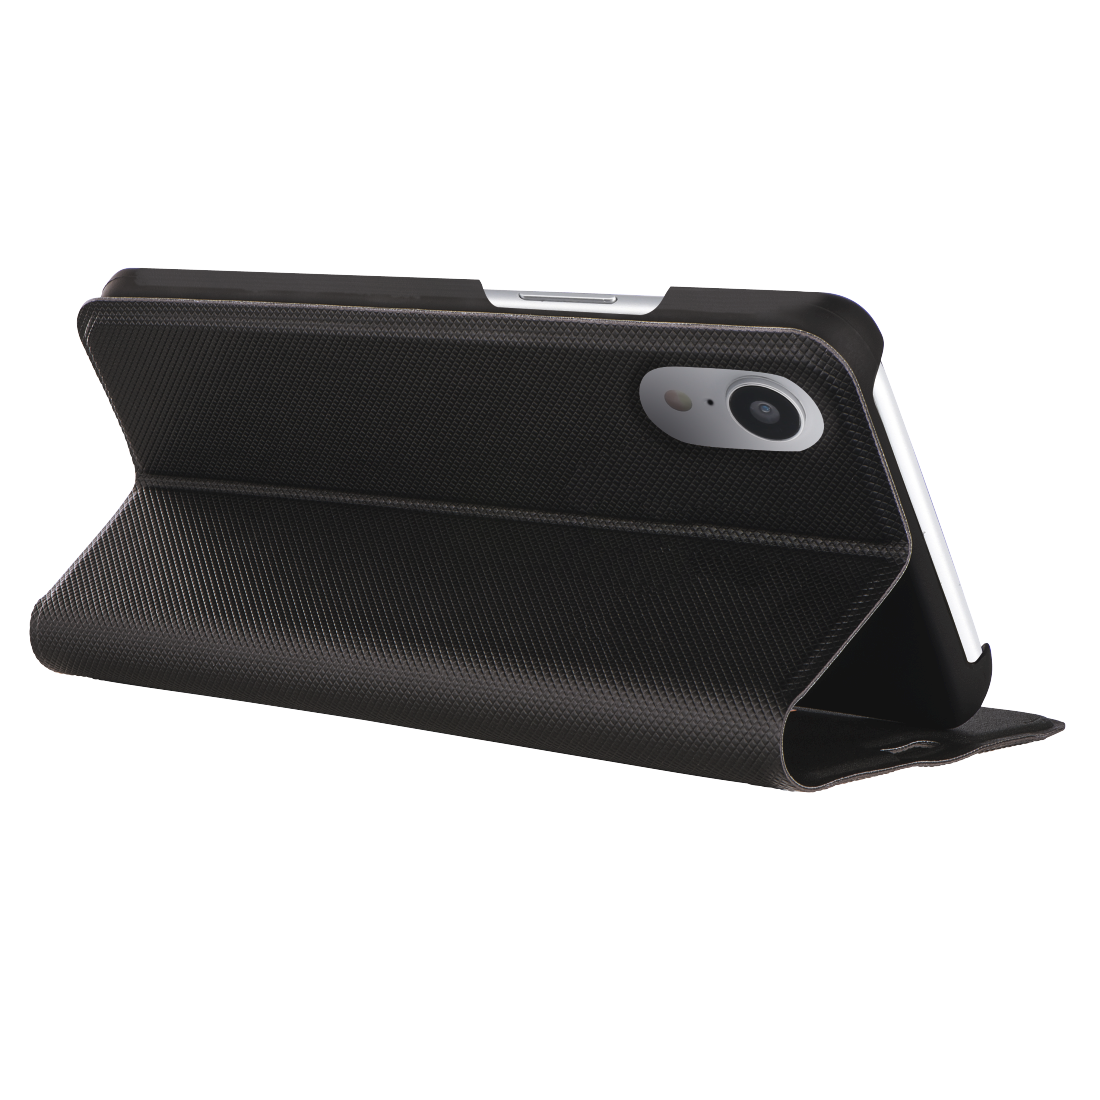 00184289 Hama Booklet Slim Pro Für Apple Iphone Xr